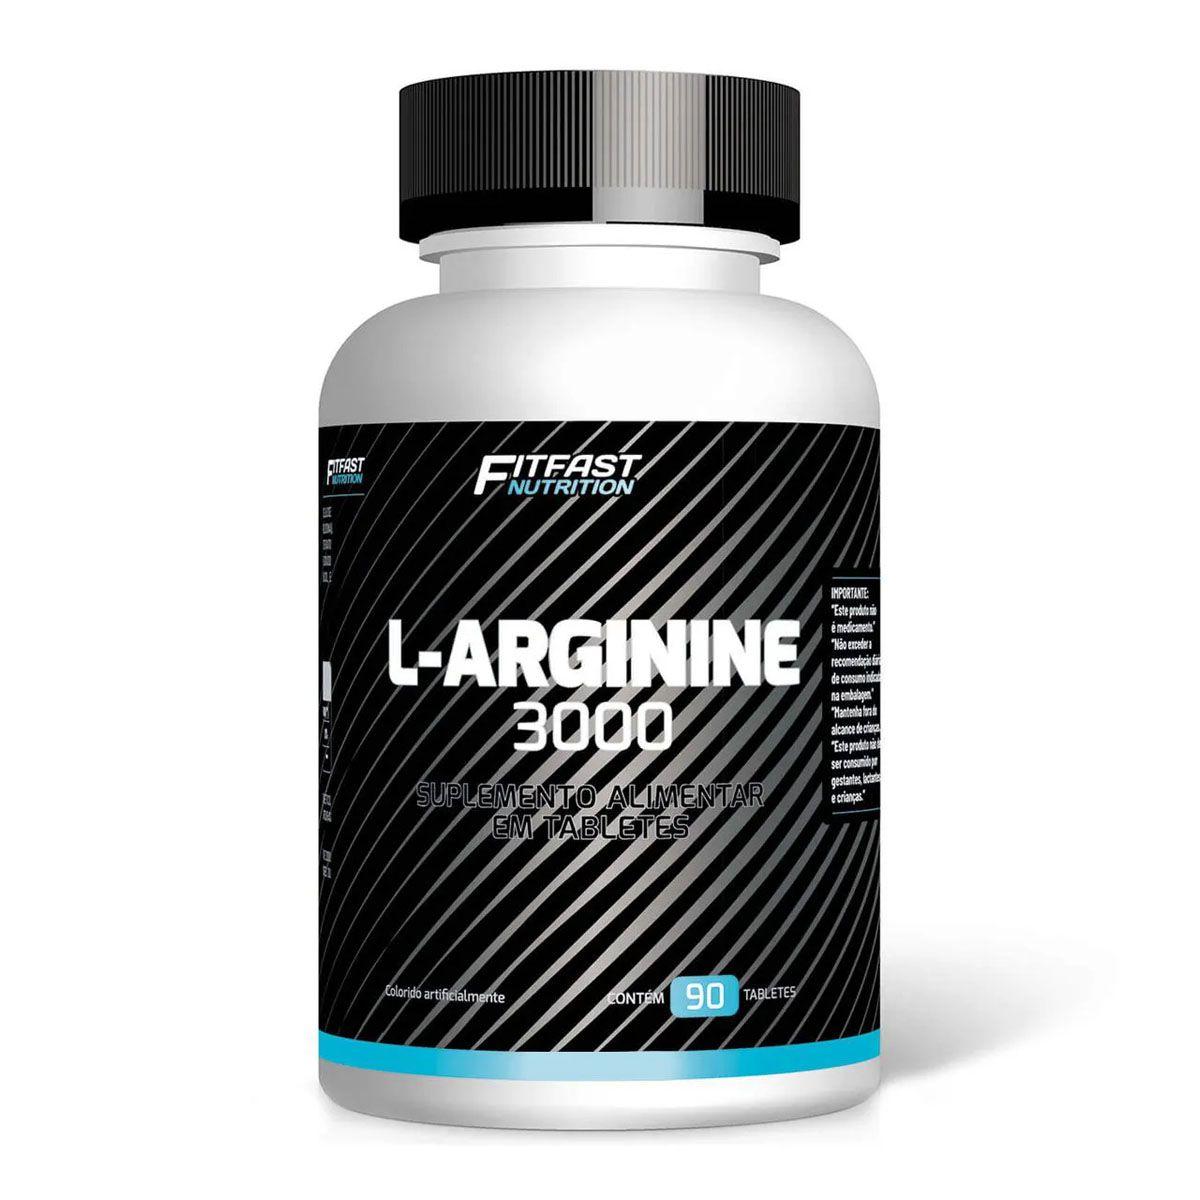 L-Arginine 3000 90 Tabletes - Fit Fast